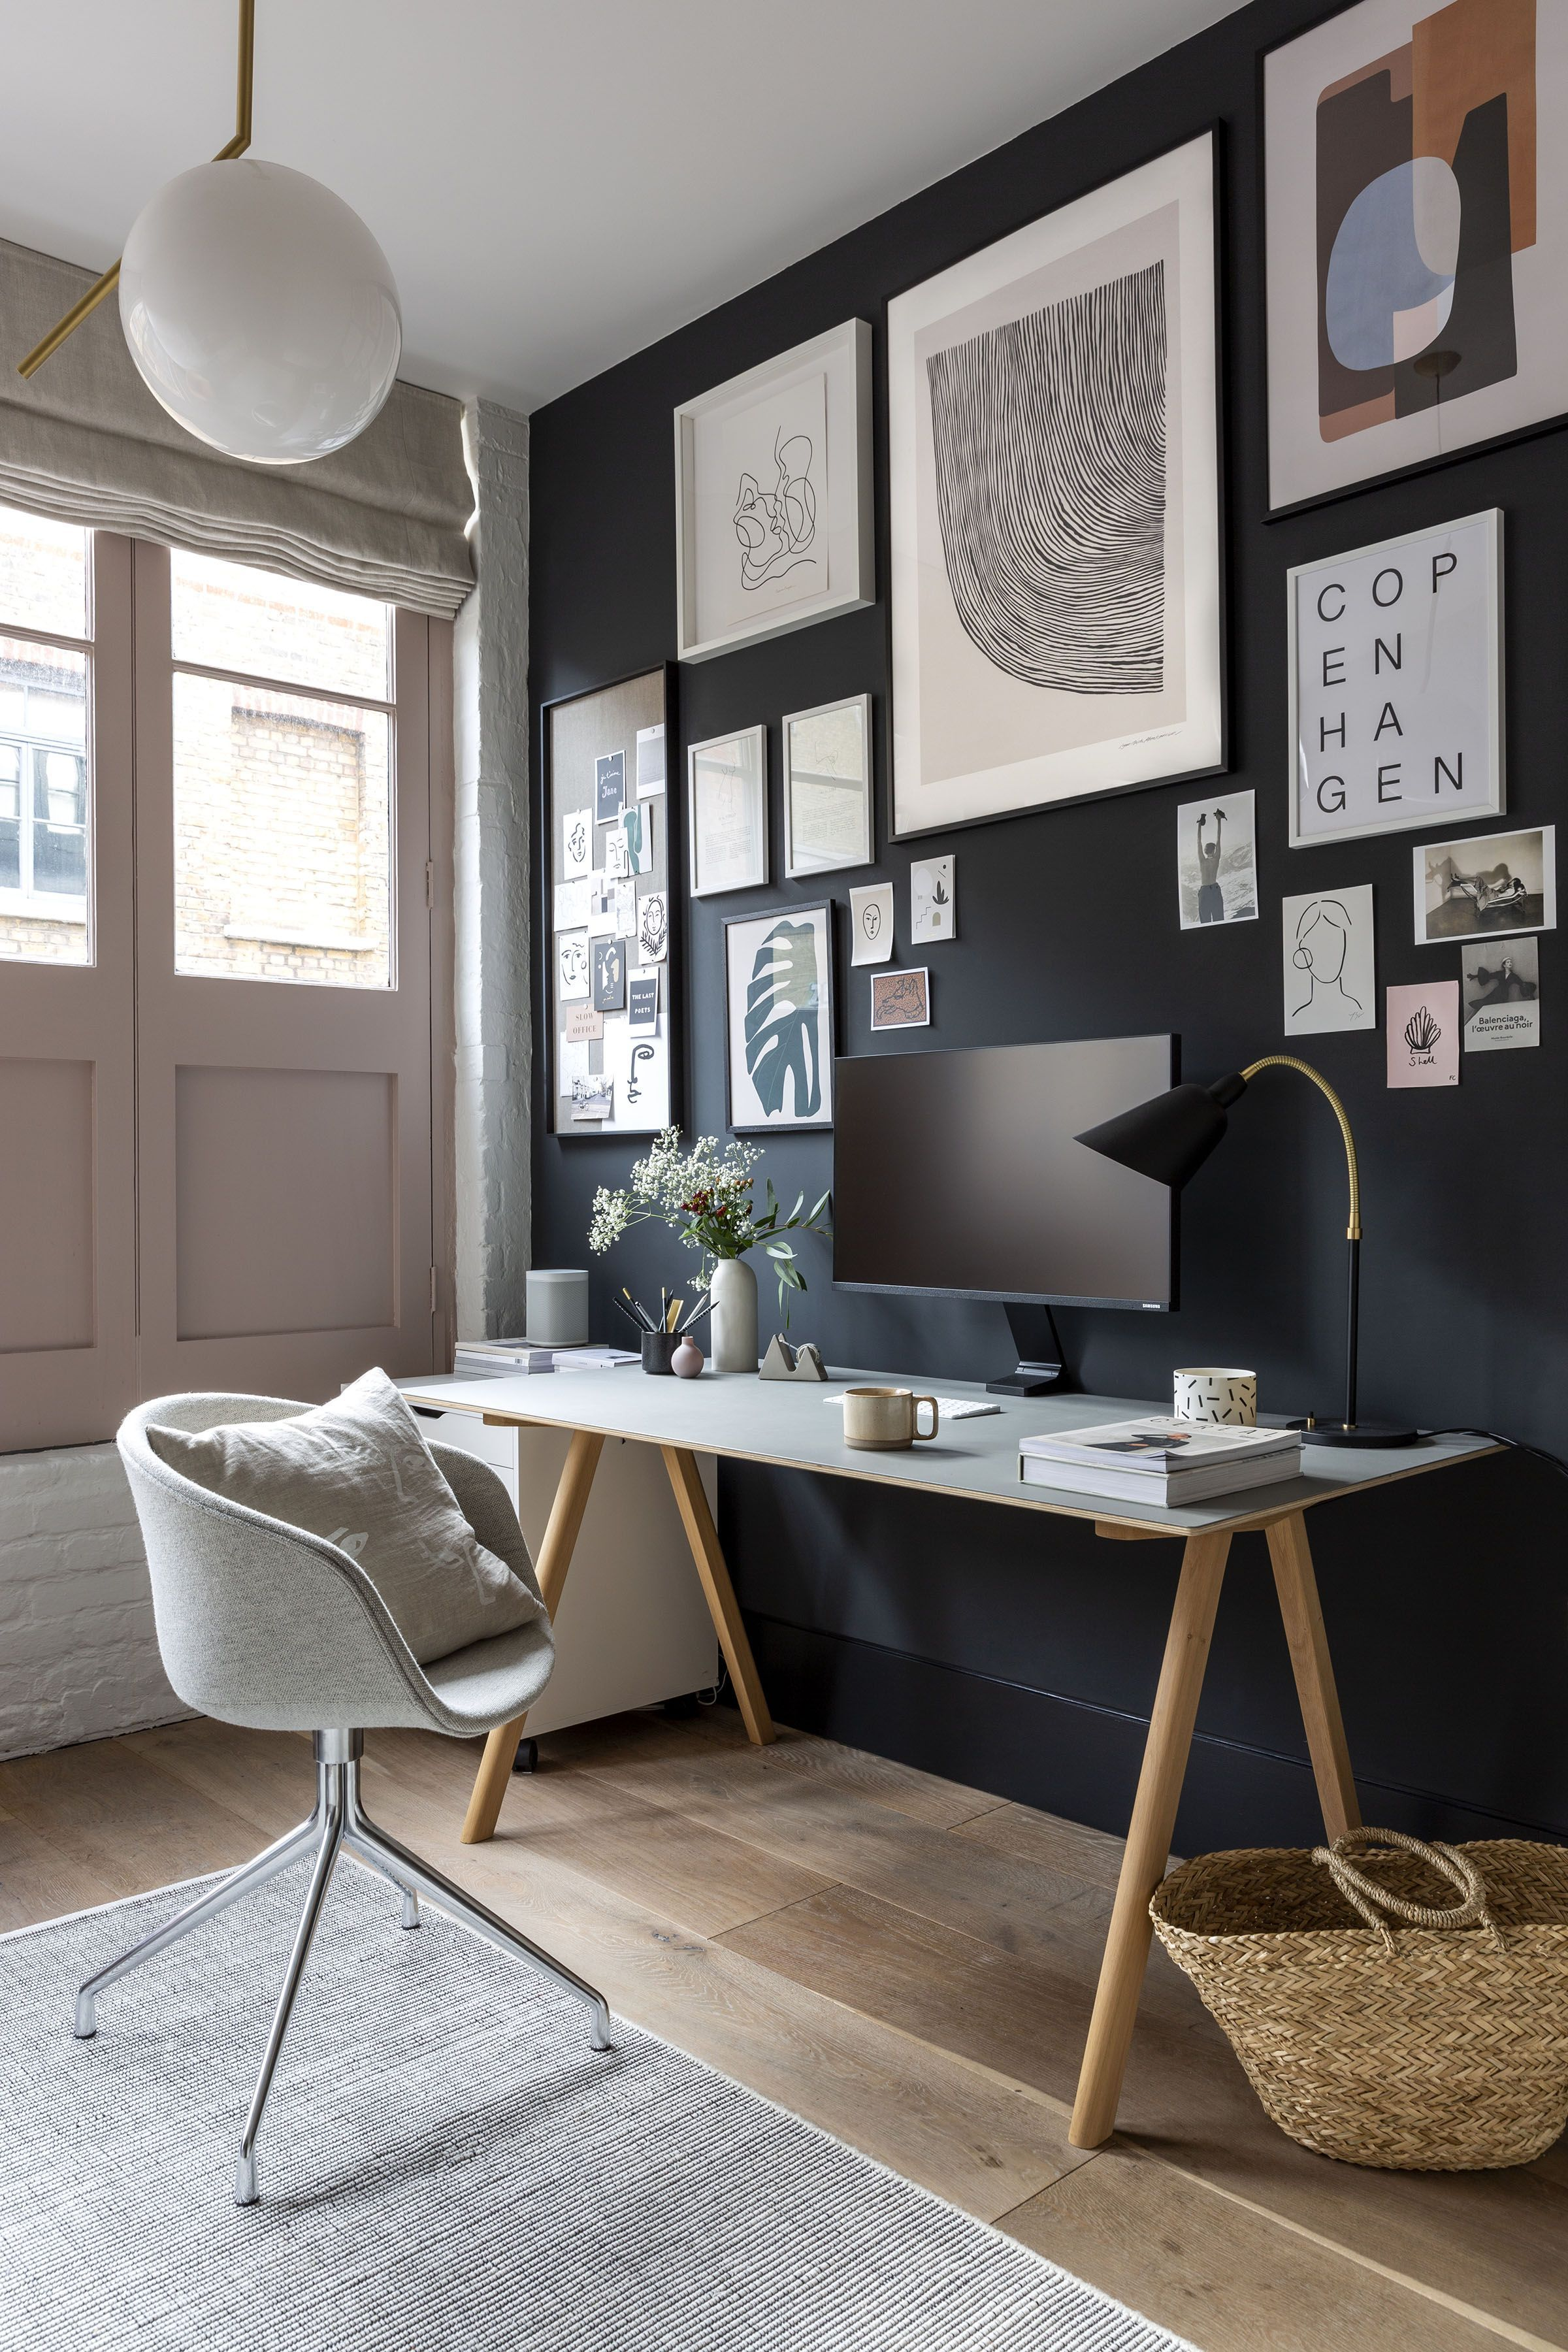 Photo of #decor A cool, minimalist home office in a Shoreditch loft apartment – decorideas